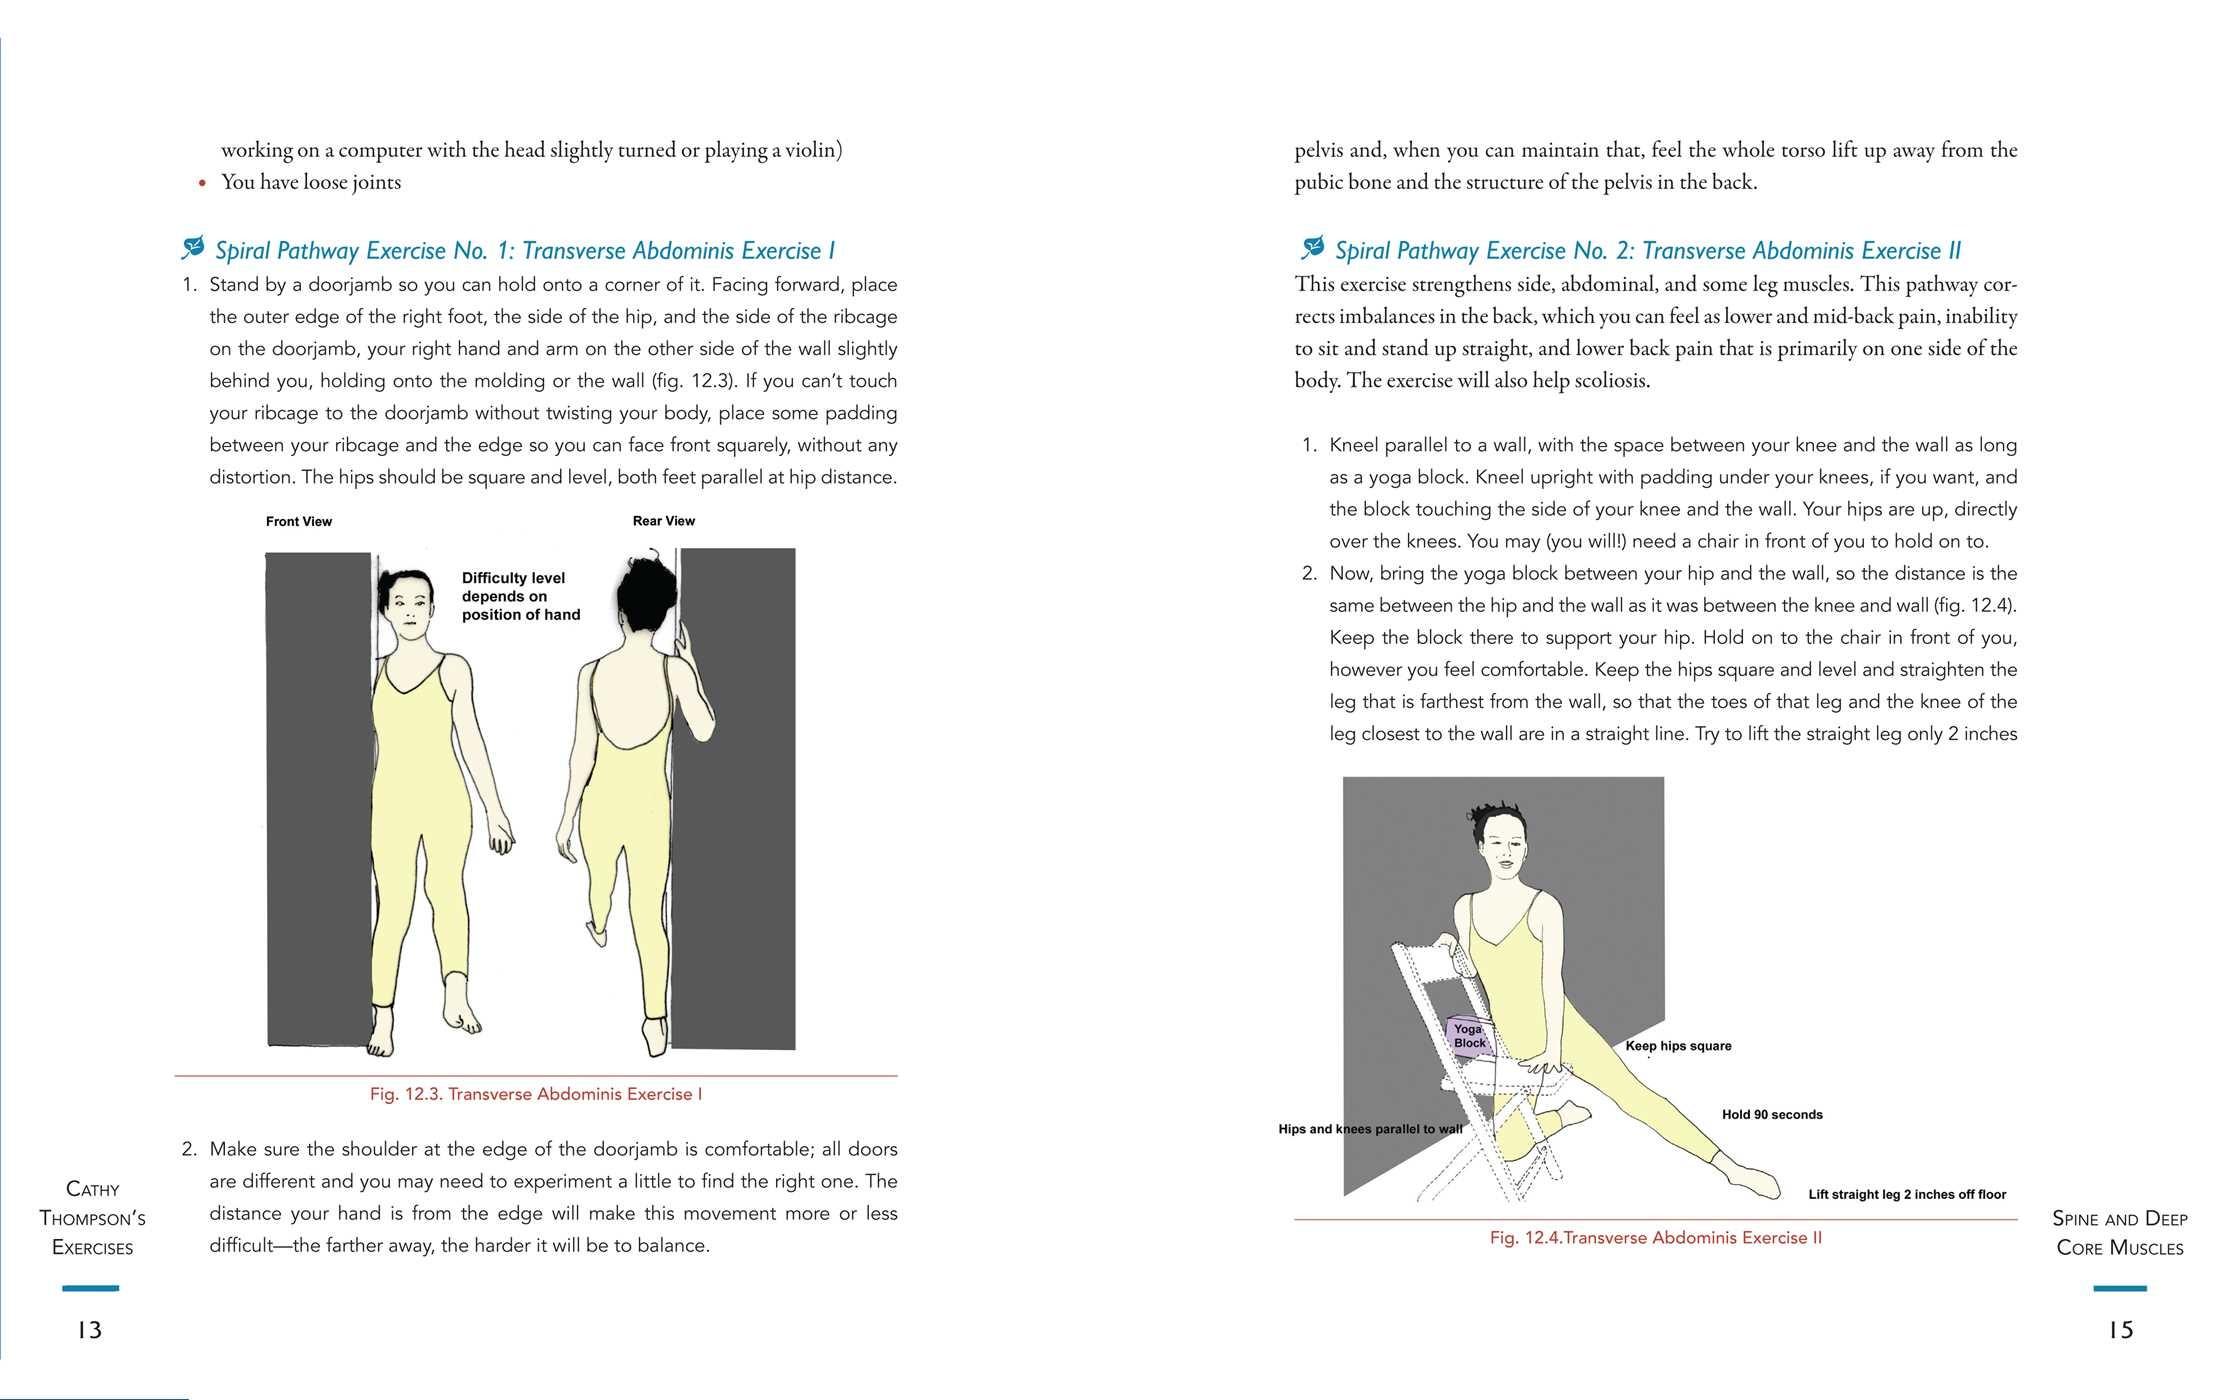 The thompson method of bodywork 9781620556641.in02